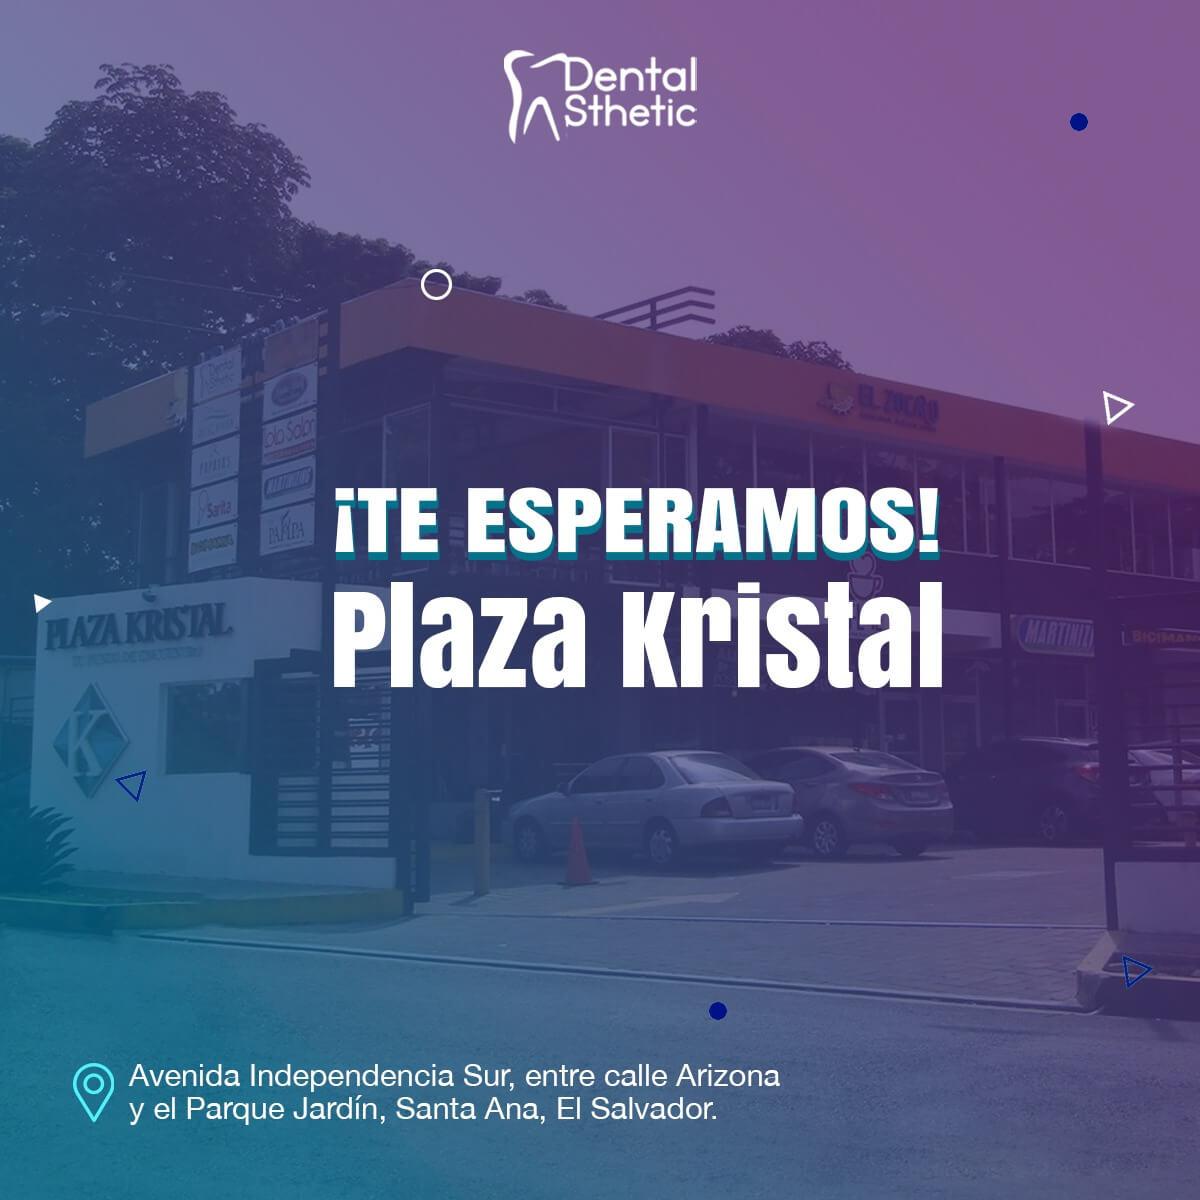 dental-esthetic-plaza-kristal-05